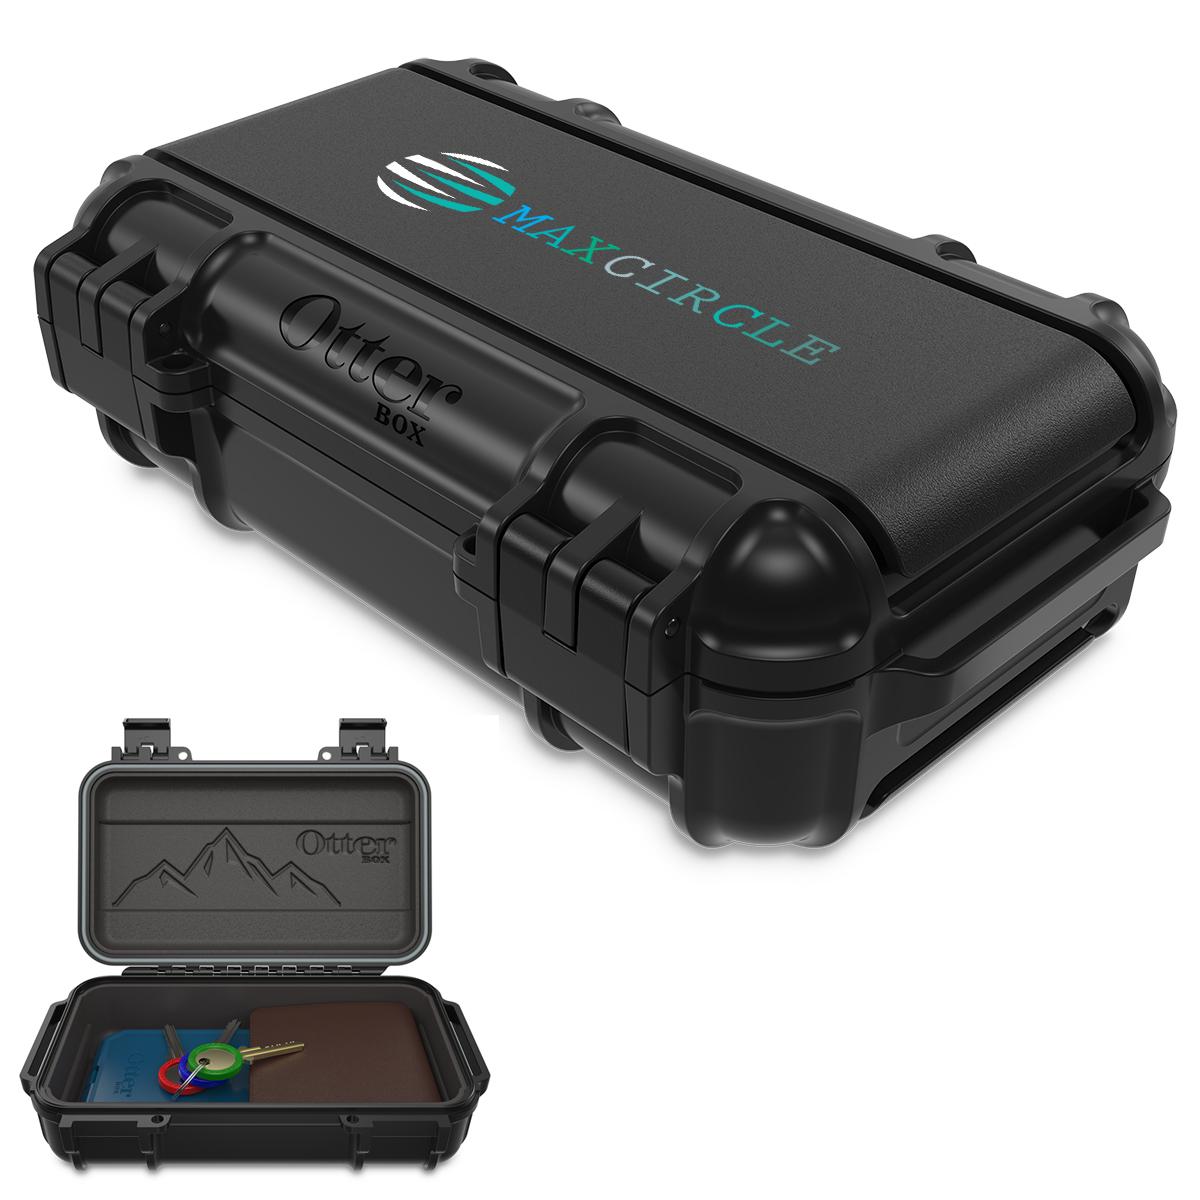 515937938-816 - Otterbox® Drybox 3250 Series™ - thumbnail